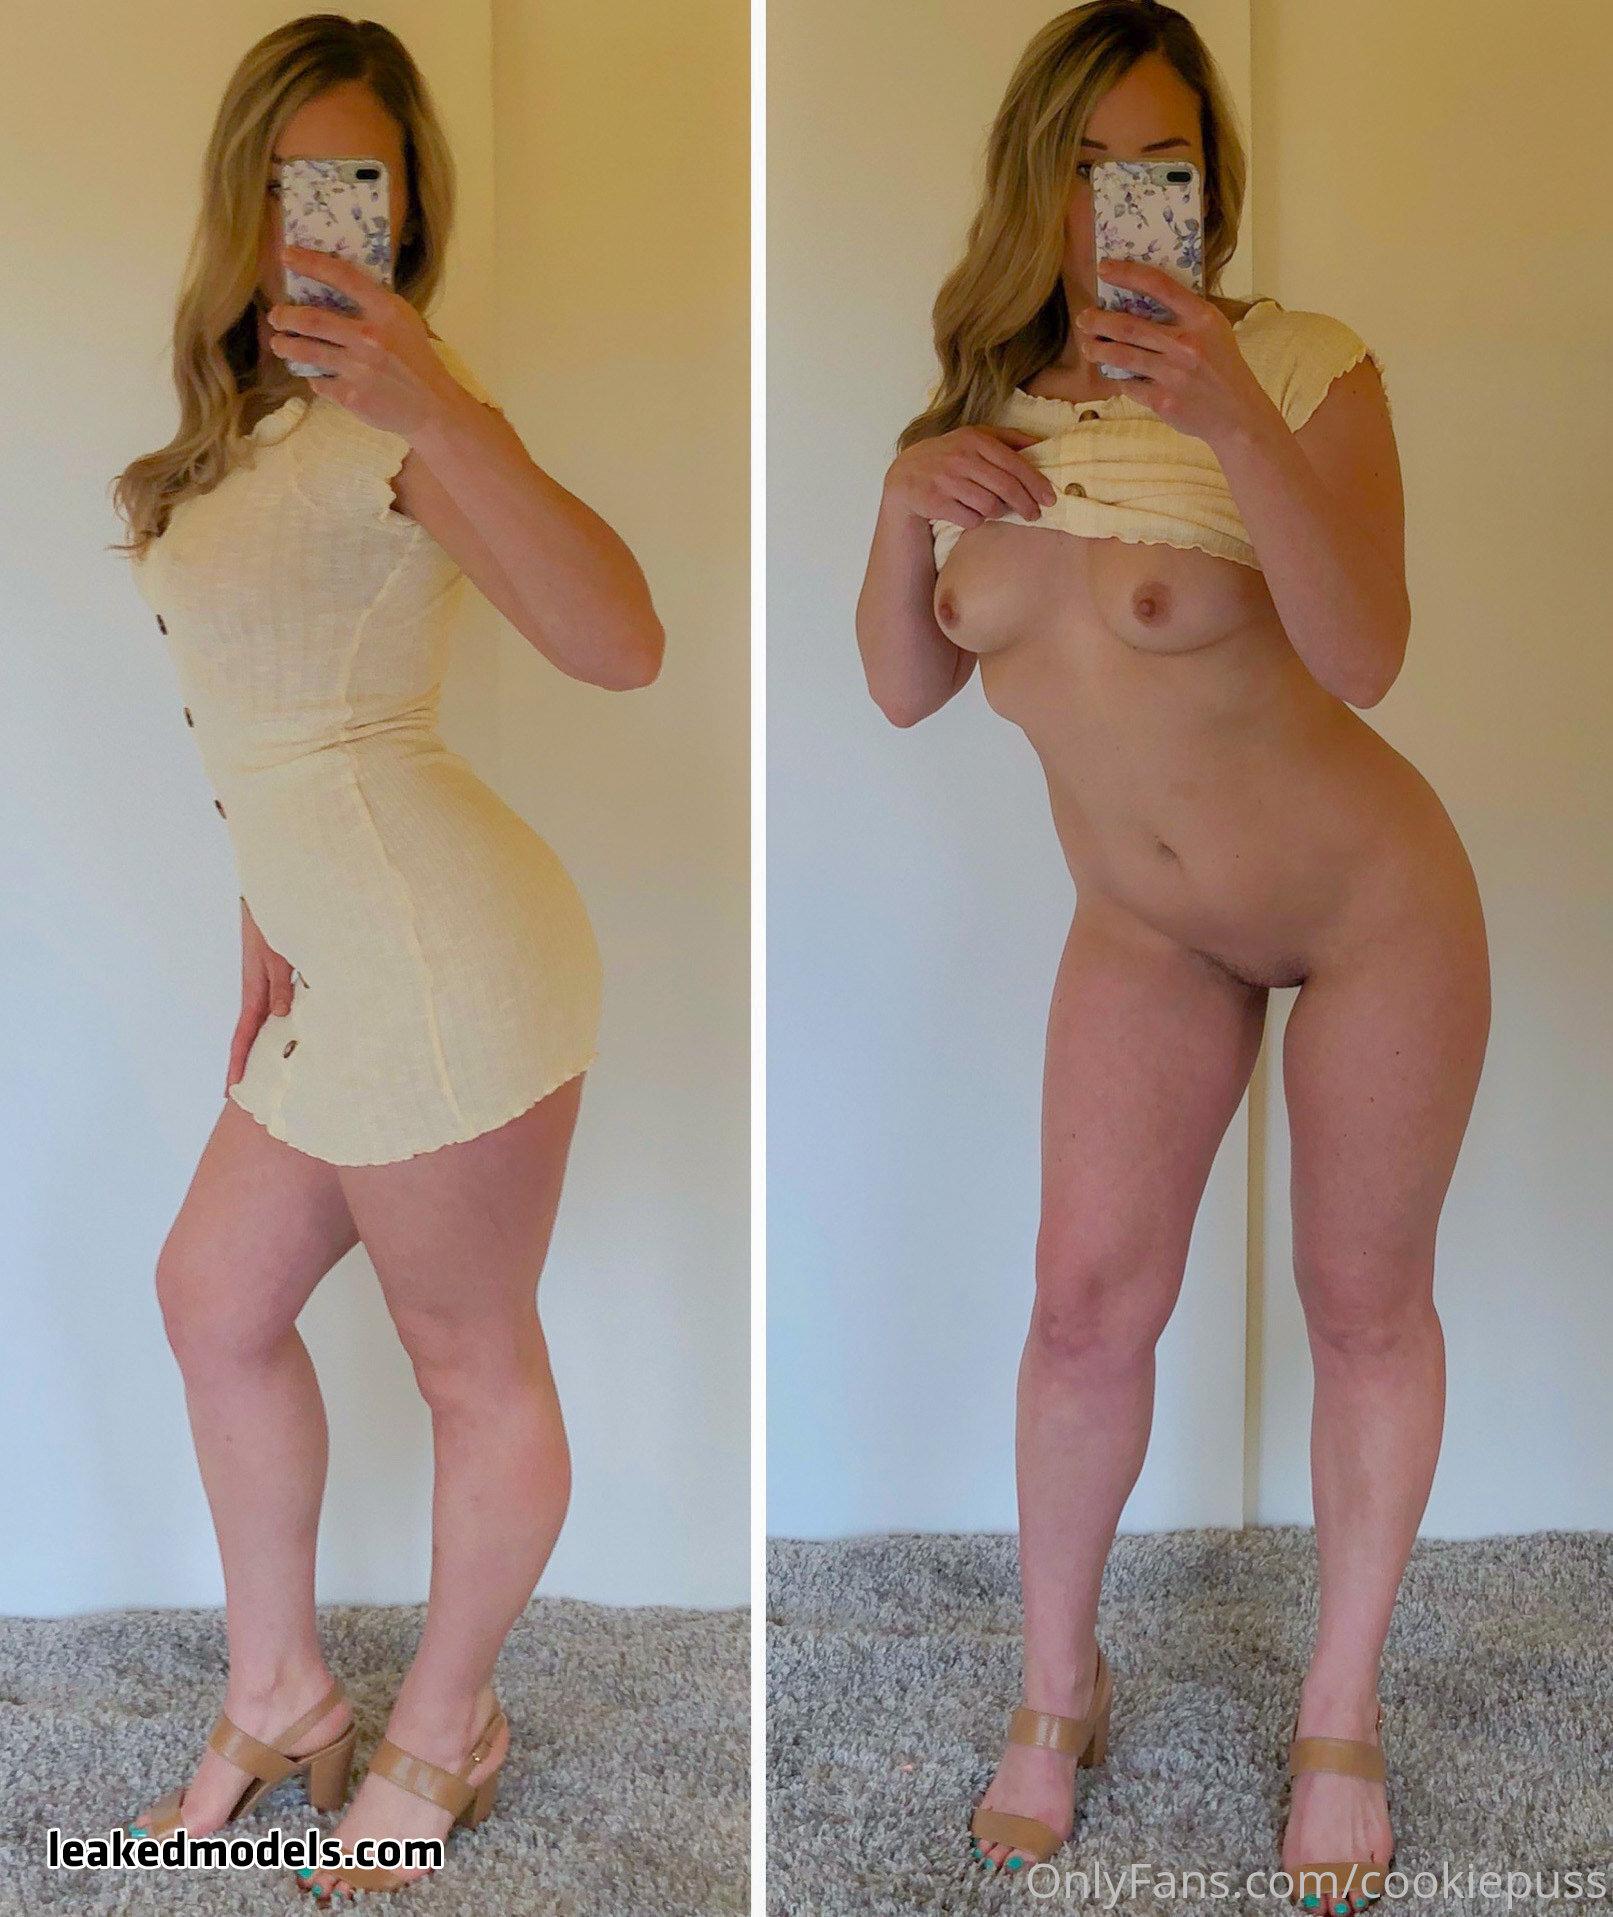 Bianca – Cookiepuss OnlyFans Nude Leaks (33 Photos)